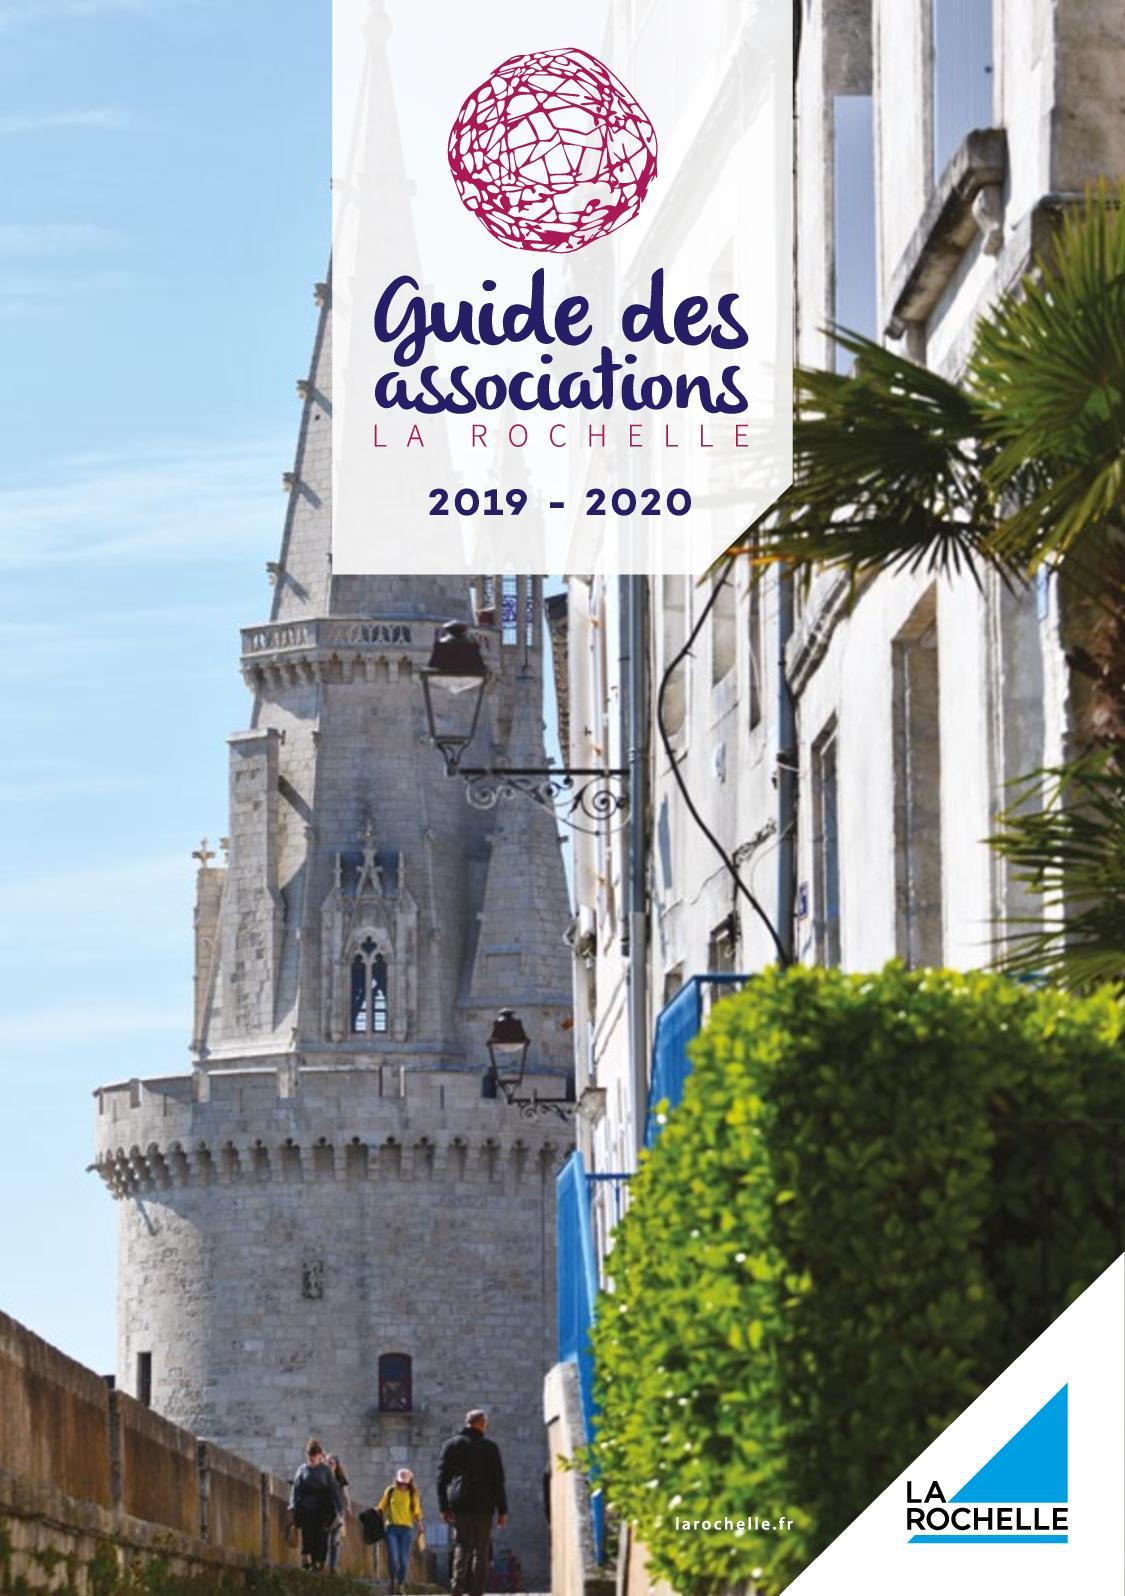 Calendrier Des Marees La Rochelle 2020.Calameo Guide Des Associations 2019 2020